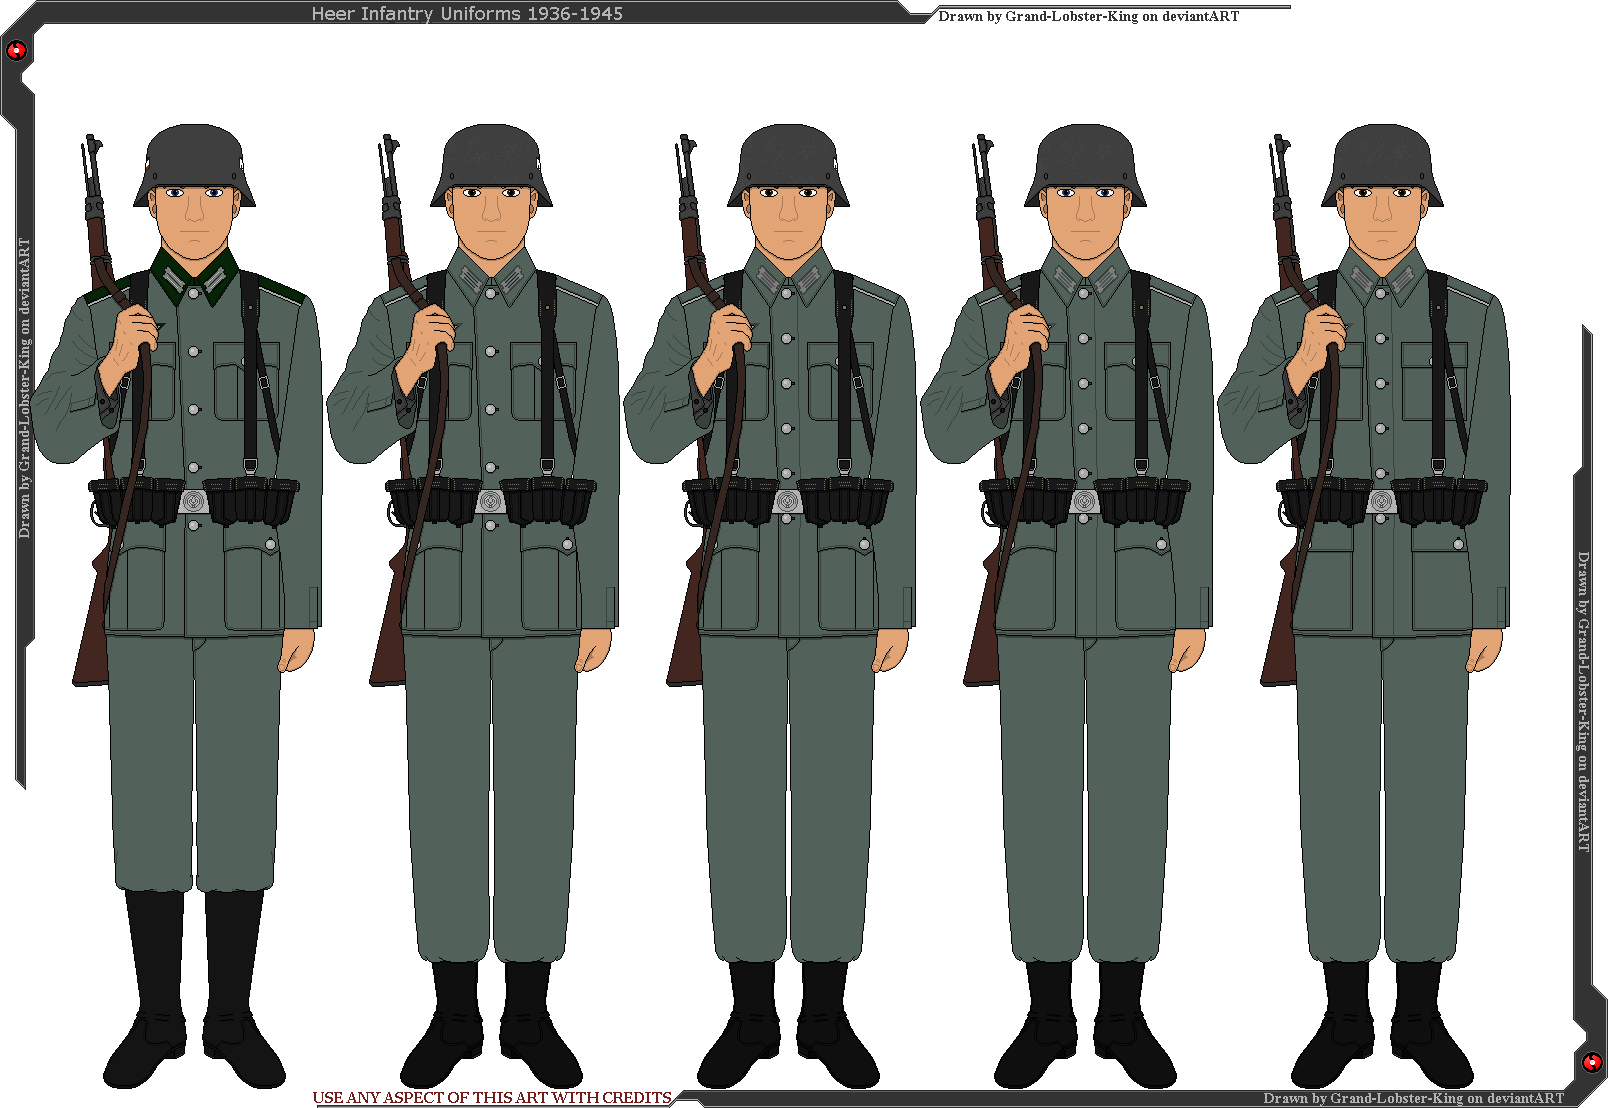 Heer Infantry Uniforms 1936-1945 by Grand-Lobster-King on DeviantArt